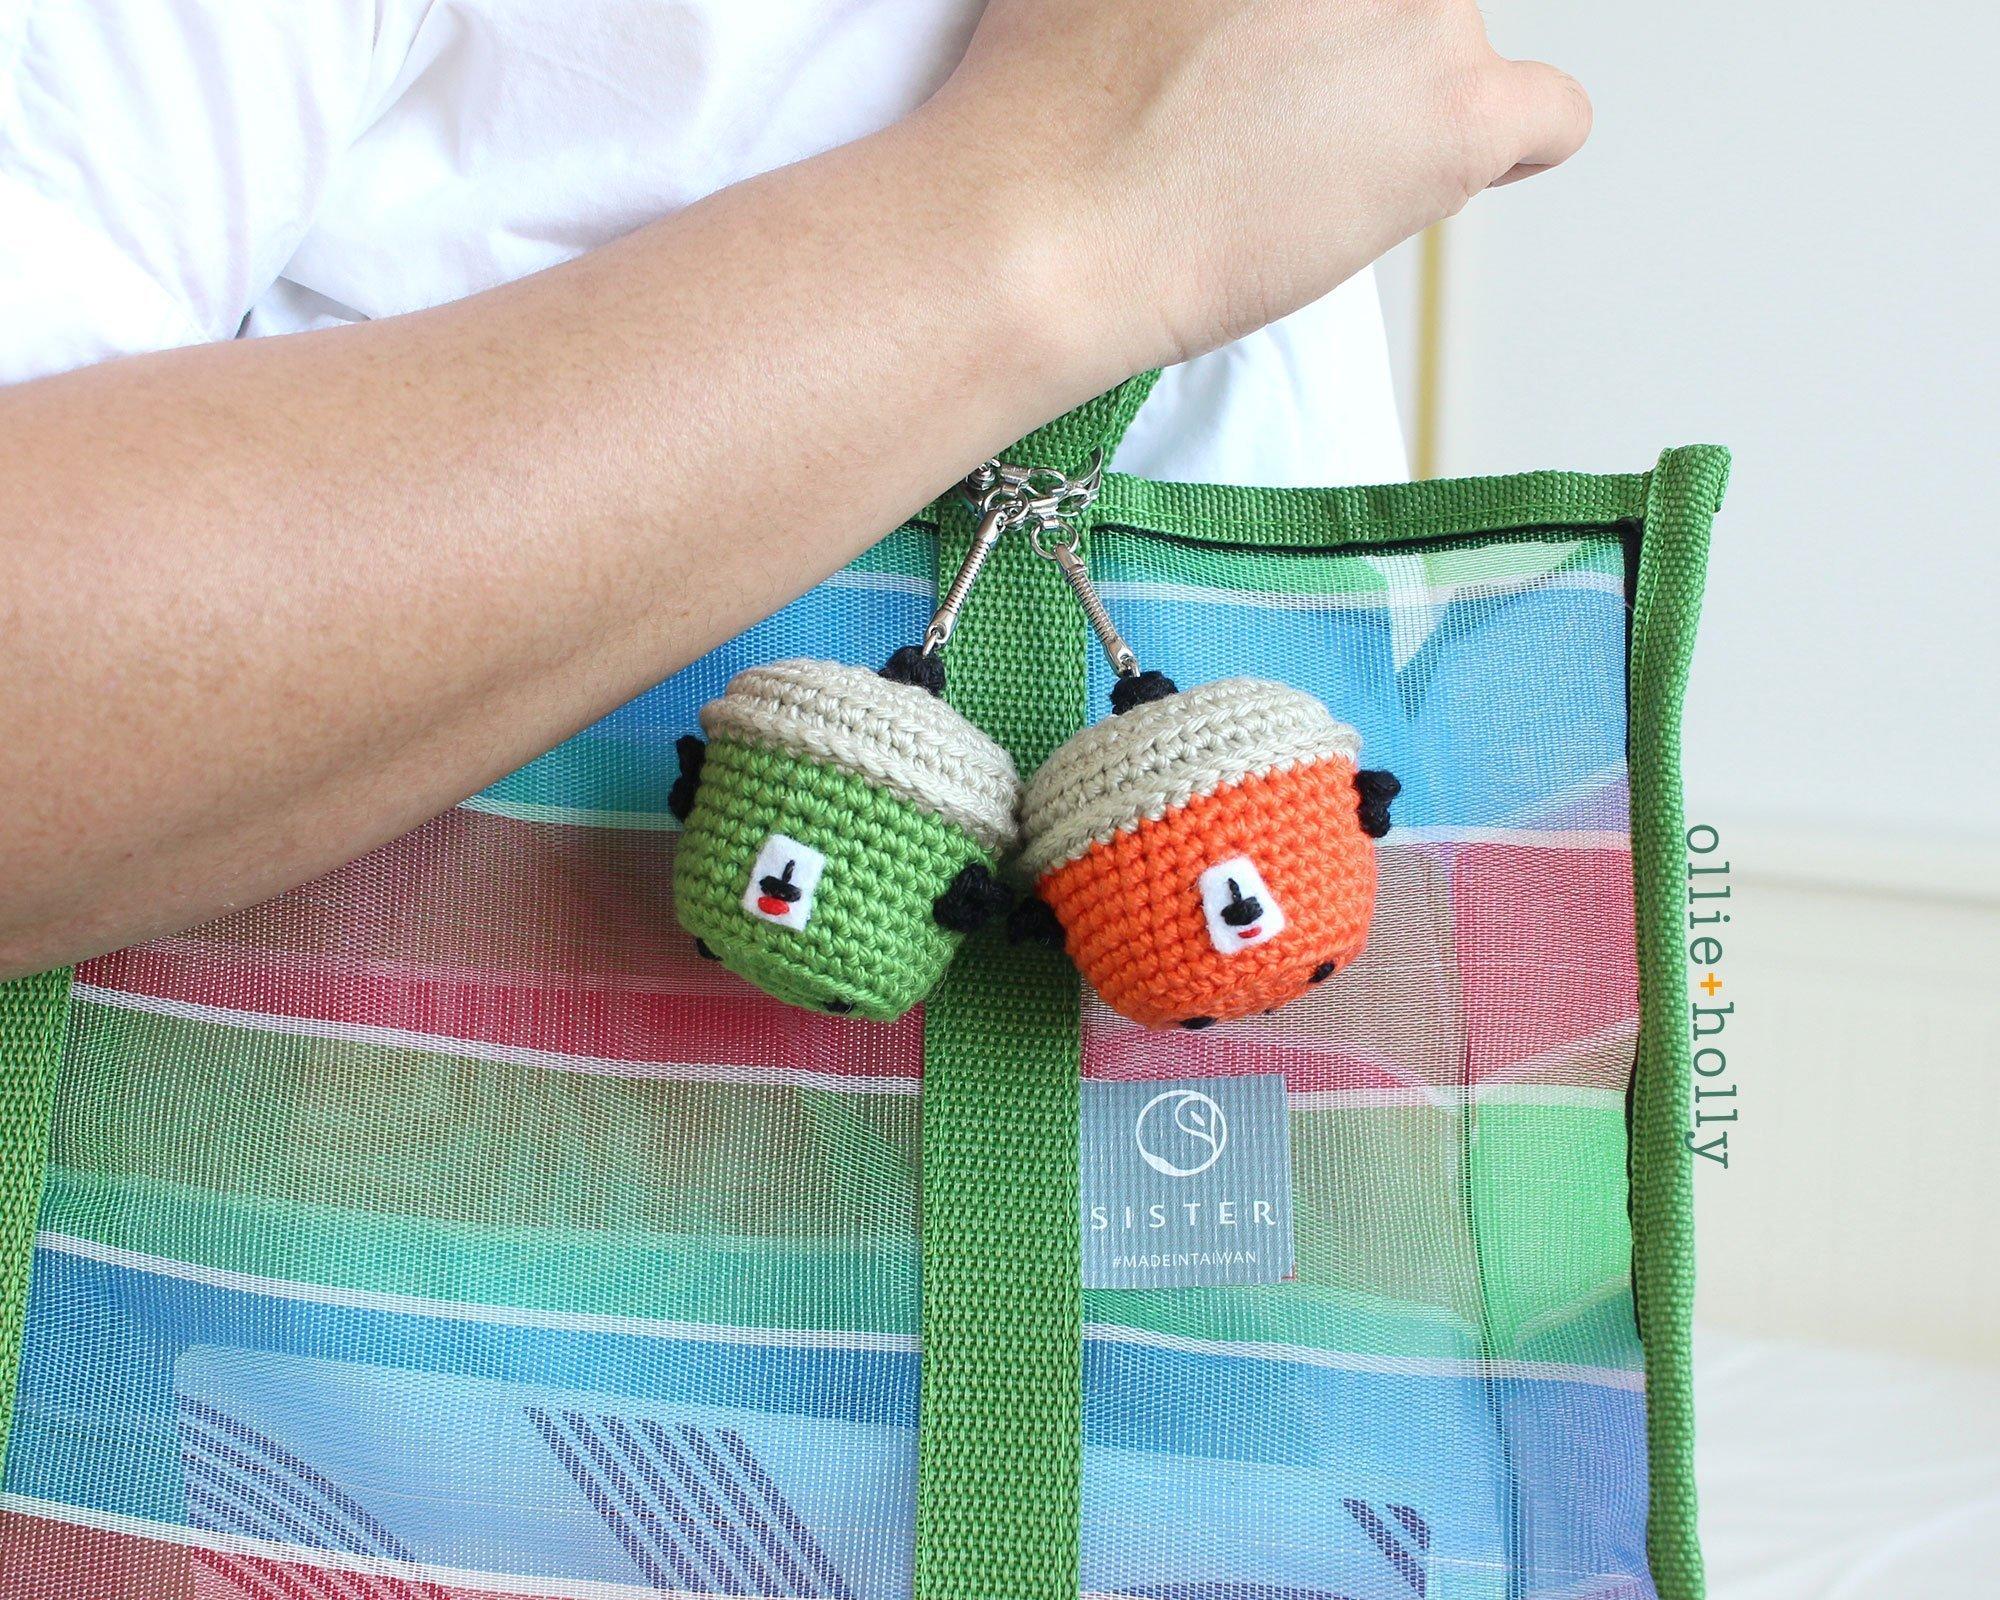 Free Taiwan Tatung Rice Cooker Amigurumi Keychain/Ornament Crochet Pattern